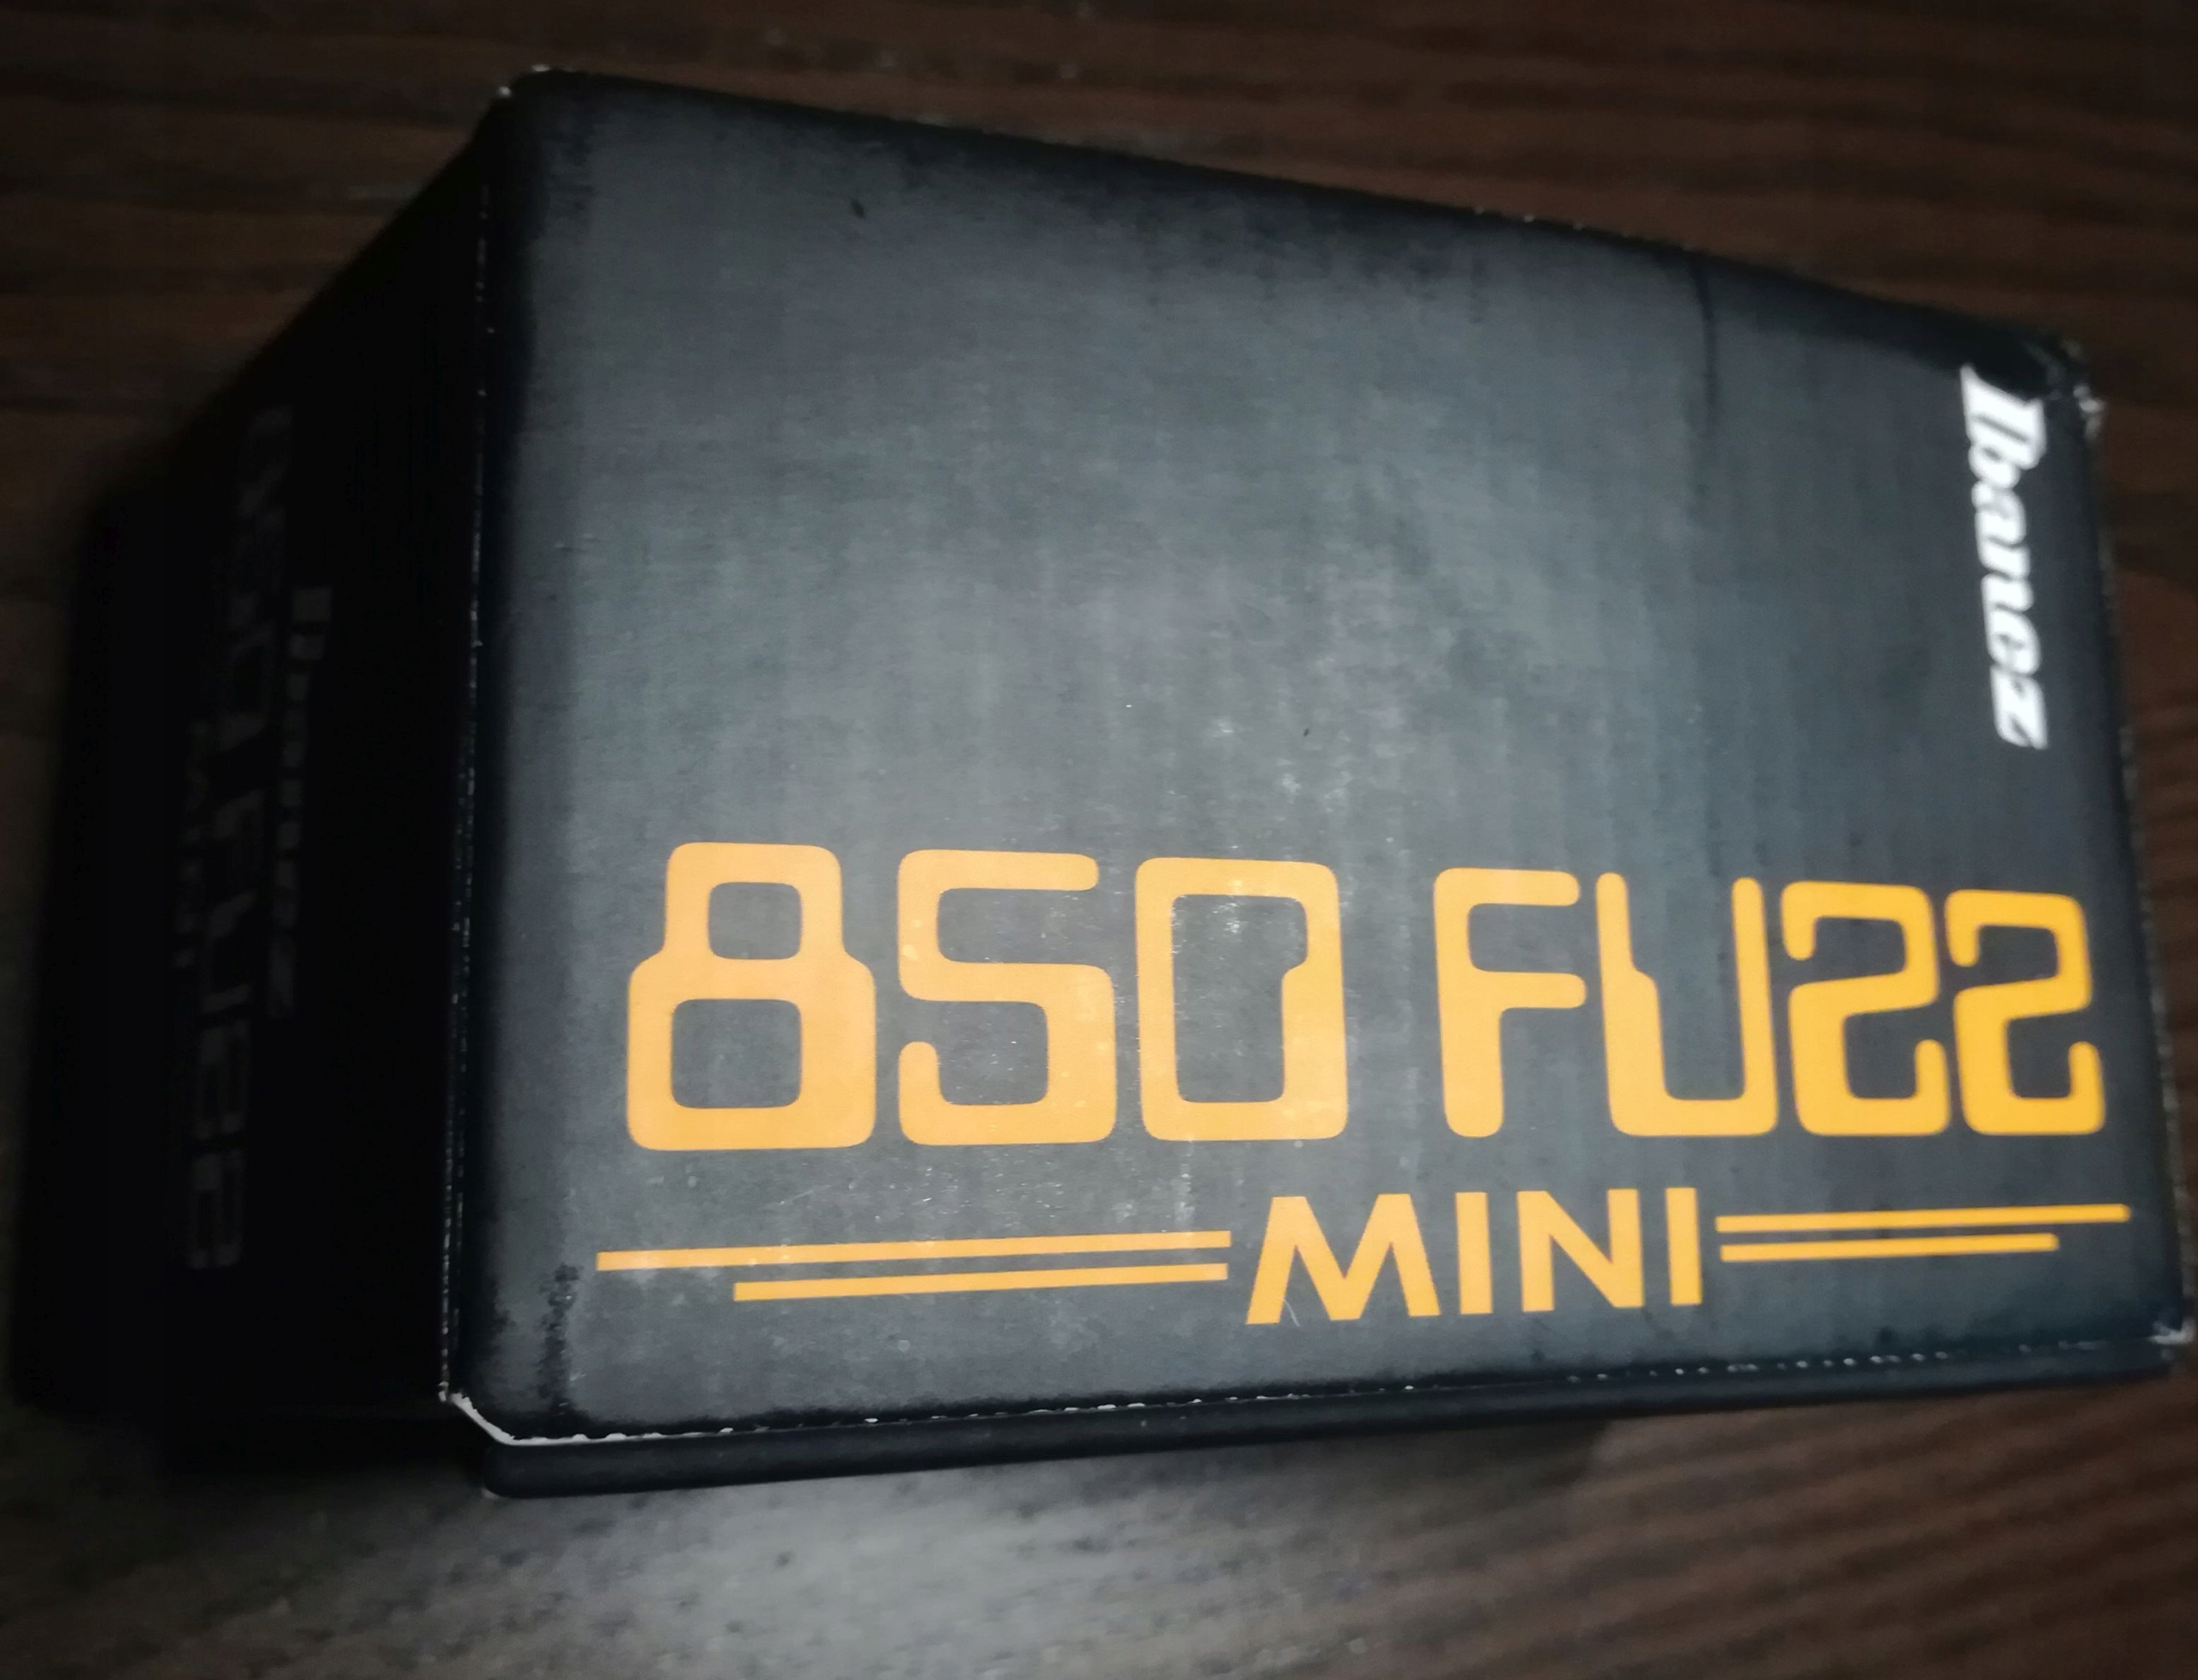 Ibanez 850 Fuzz Mini